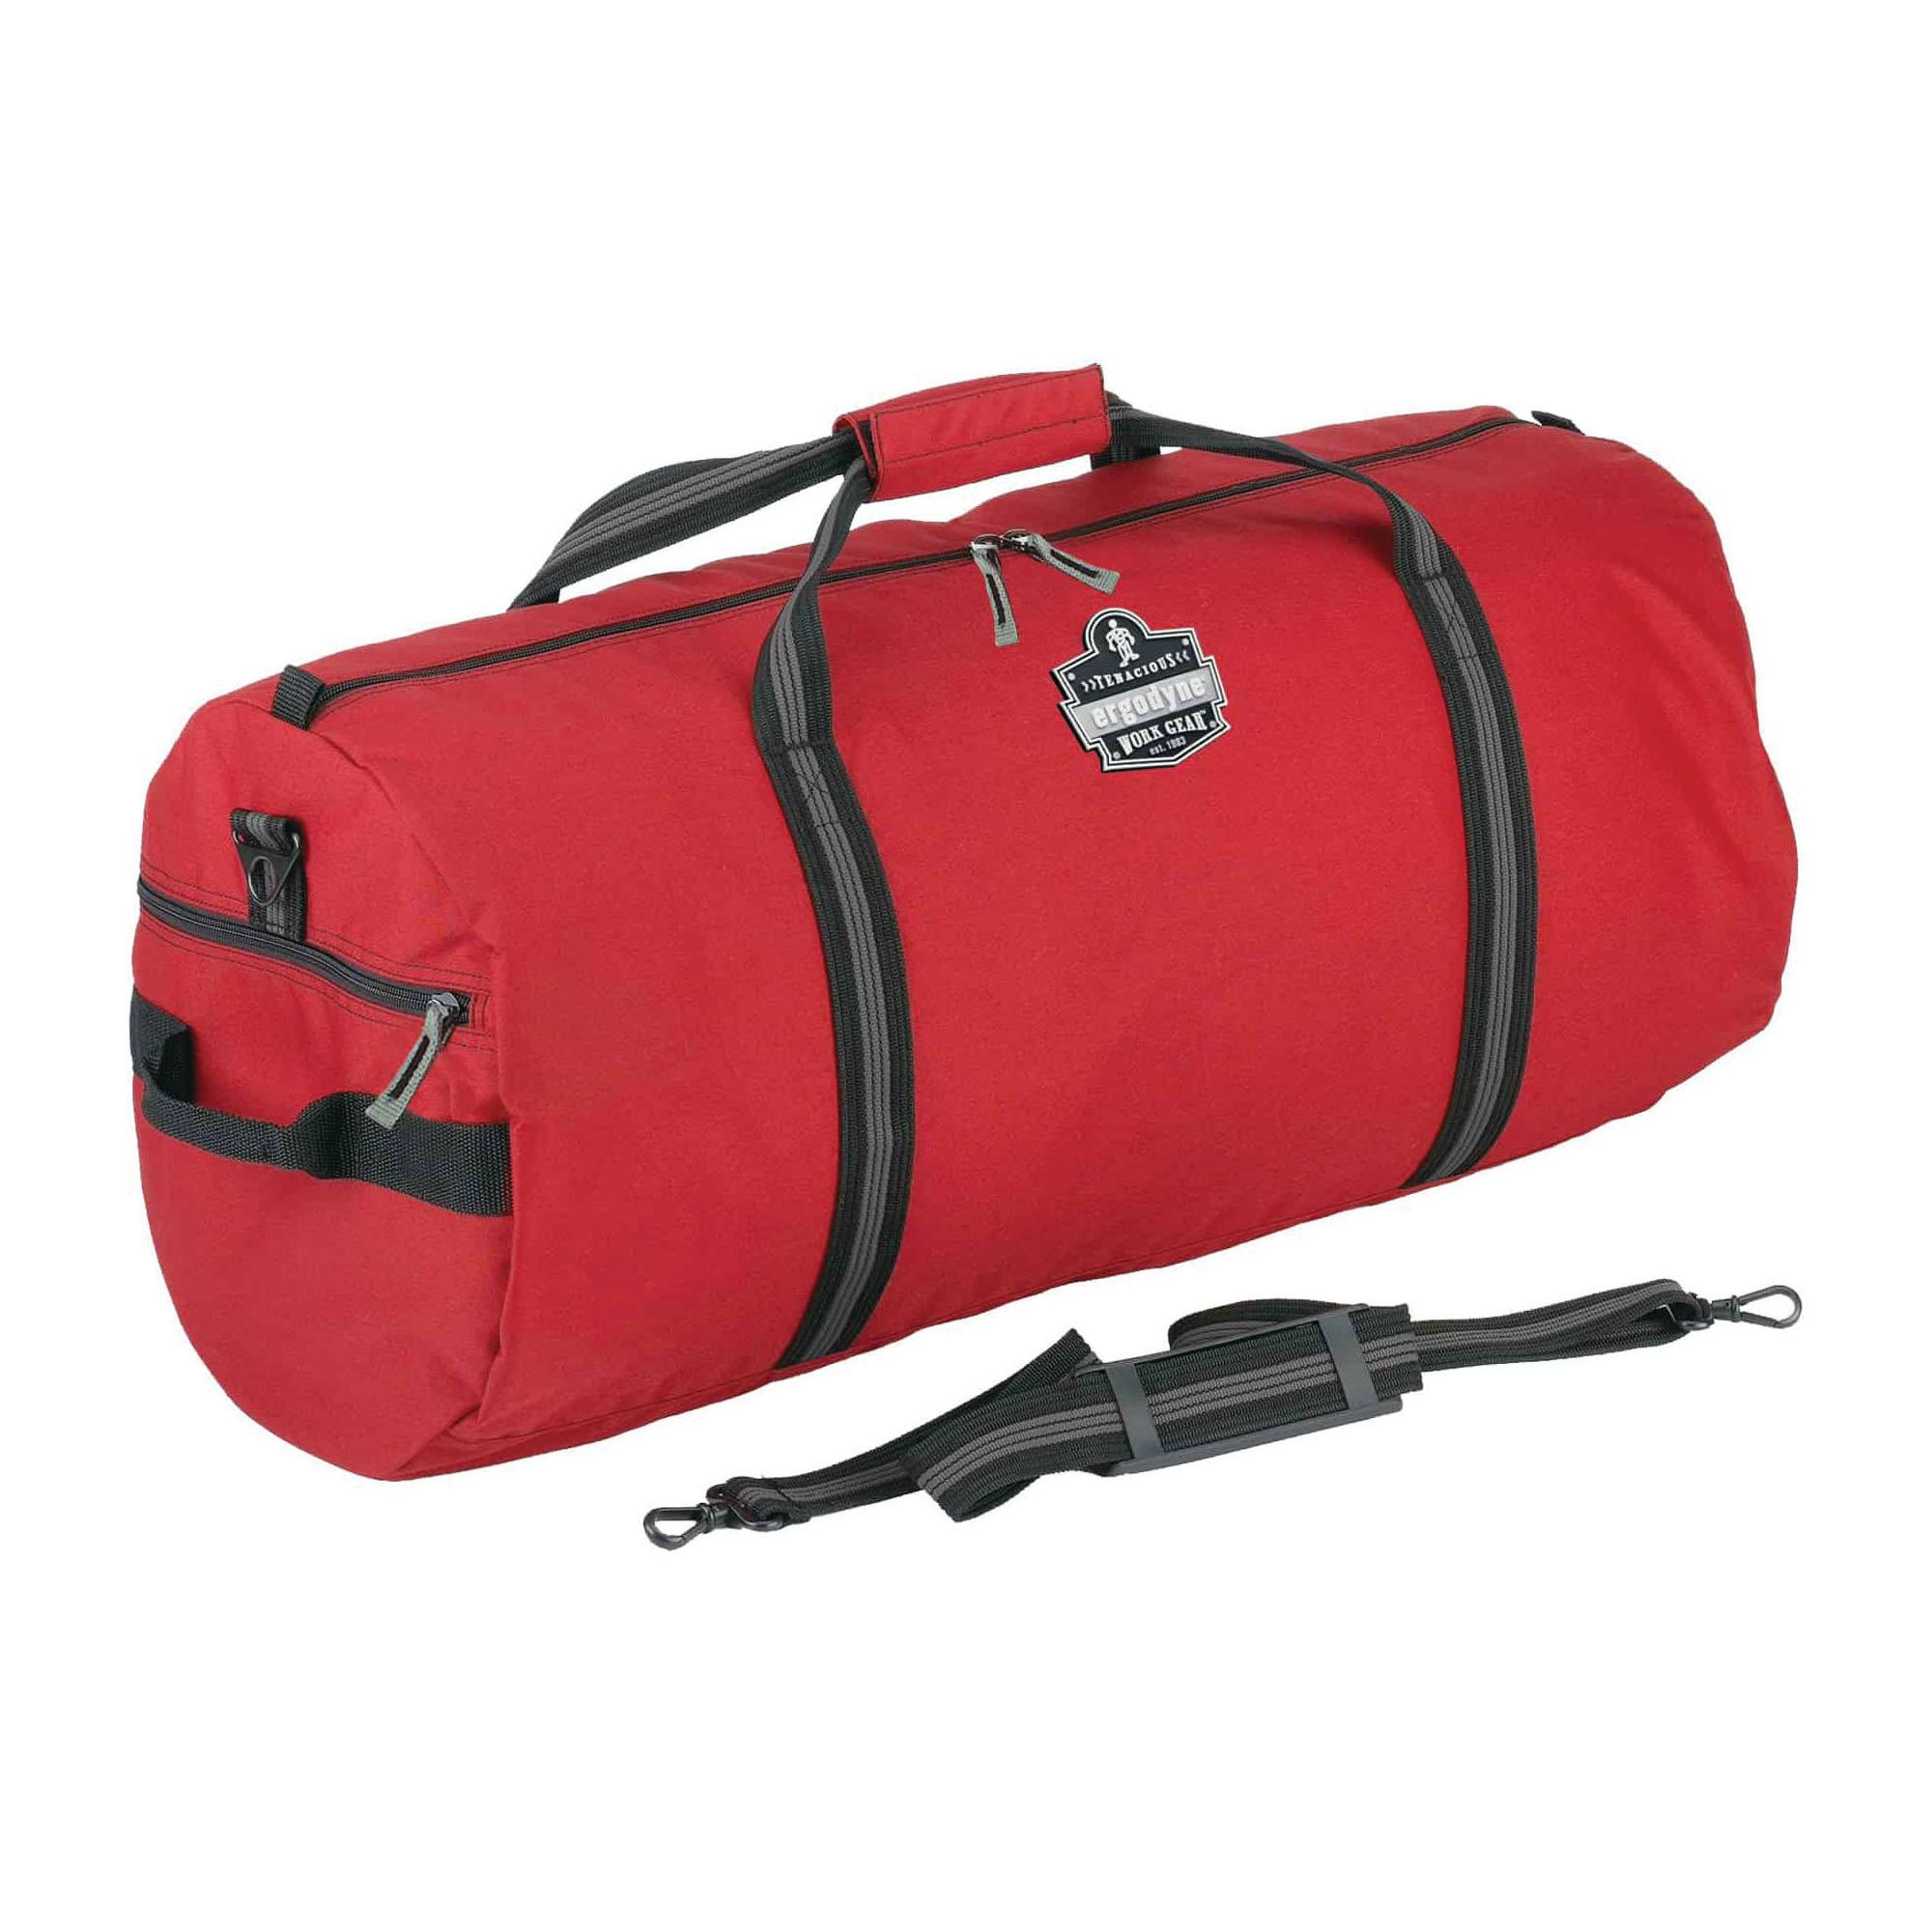 Arsenal® 13016 5116 General Duty Medium Duffel Gear Bag, Black, 600D Polyester, 2679 cu-in Storage, 12 in H x 9-1/2 in W x 23-1/2 in D